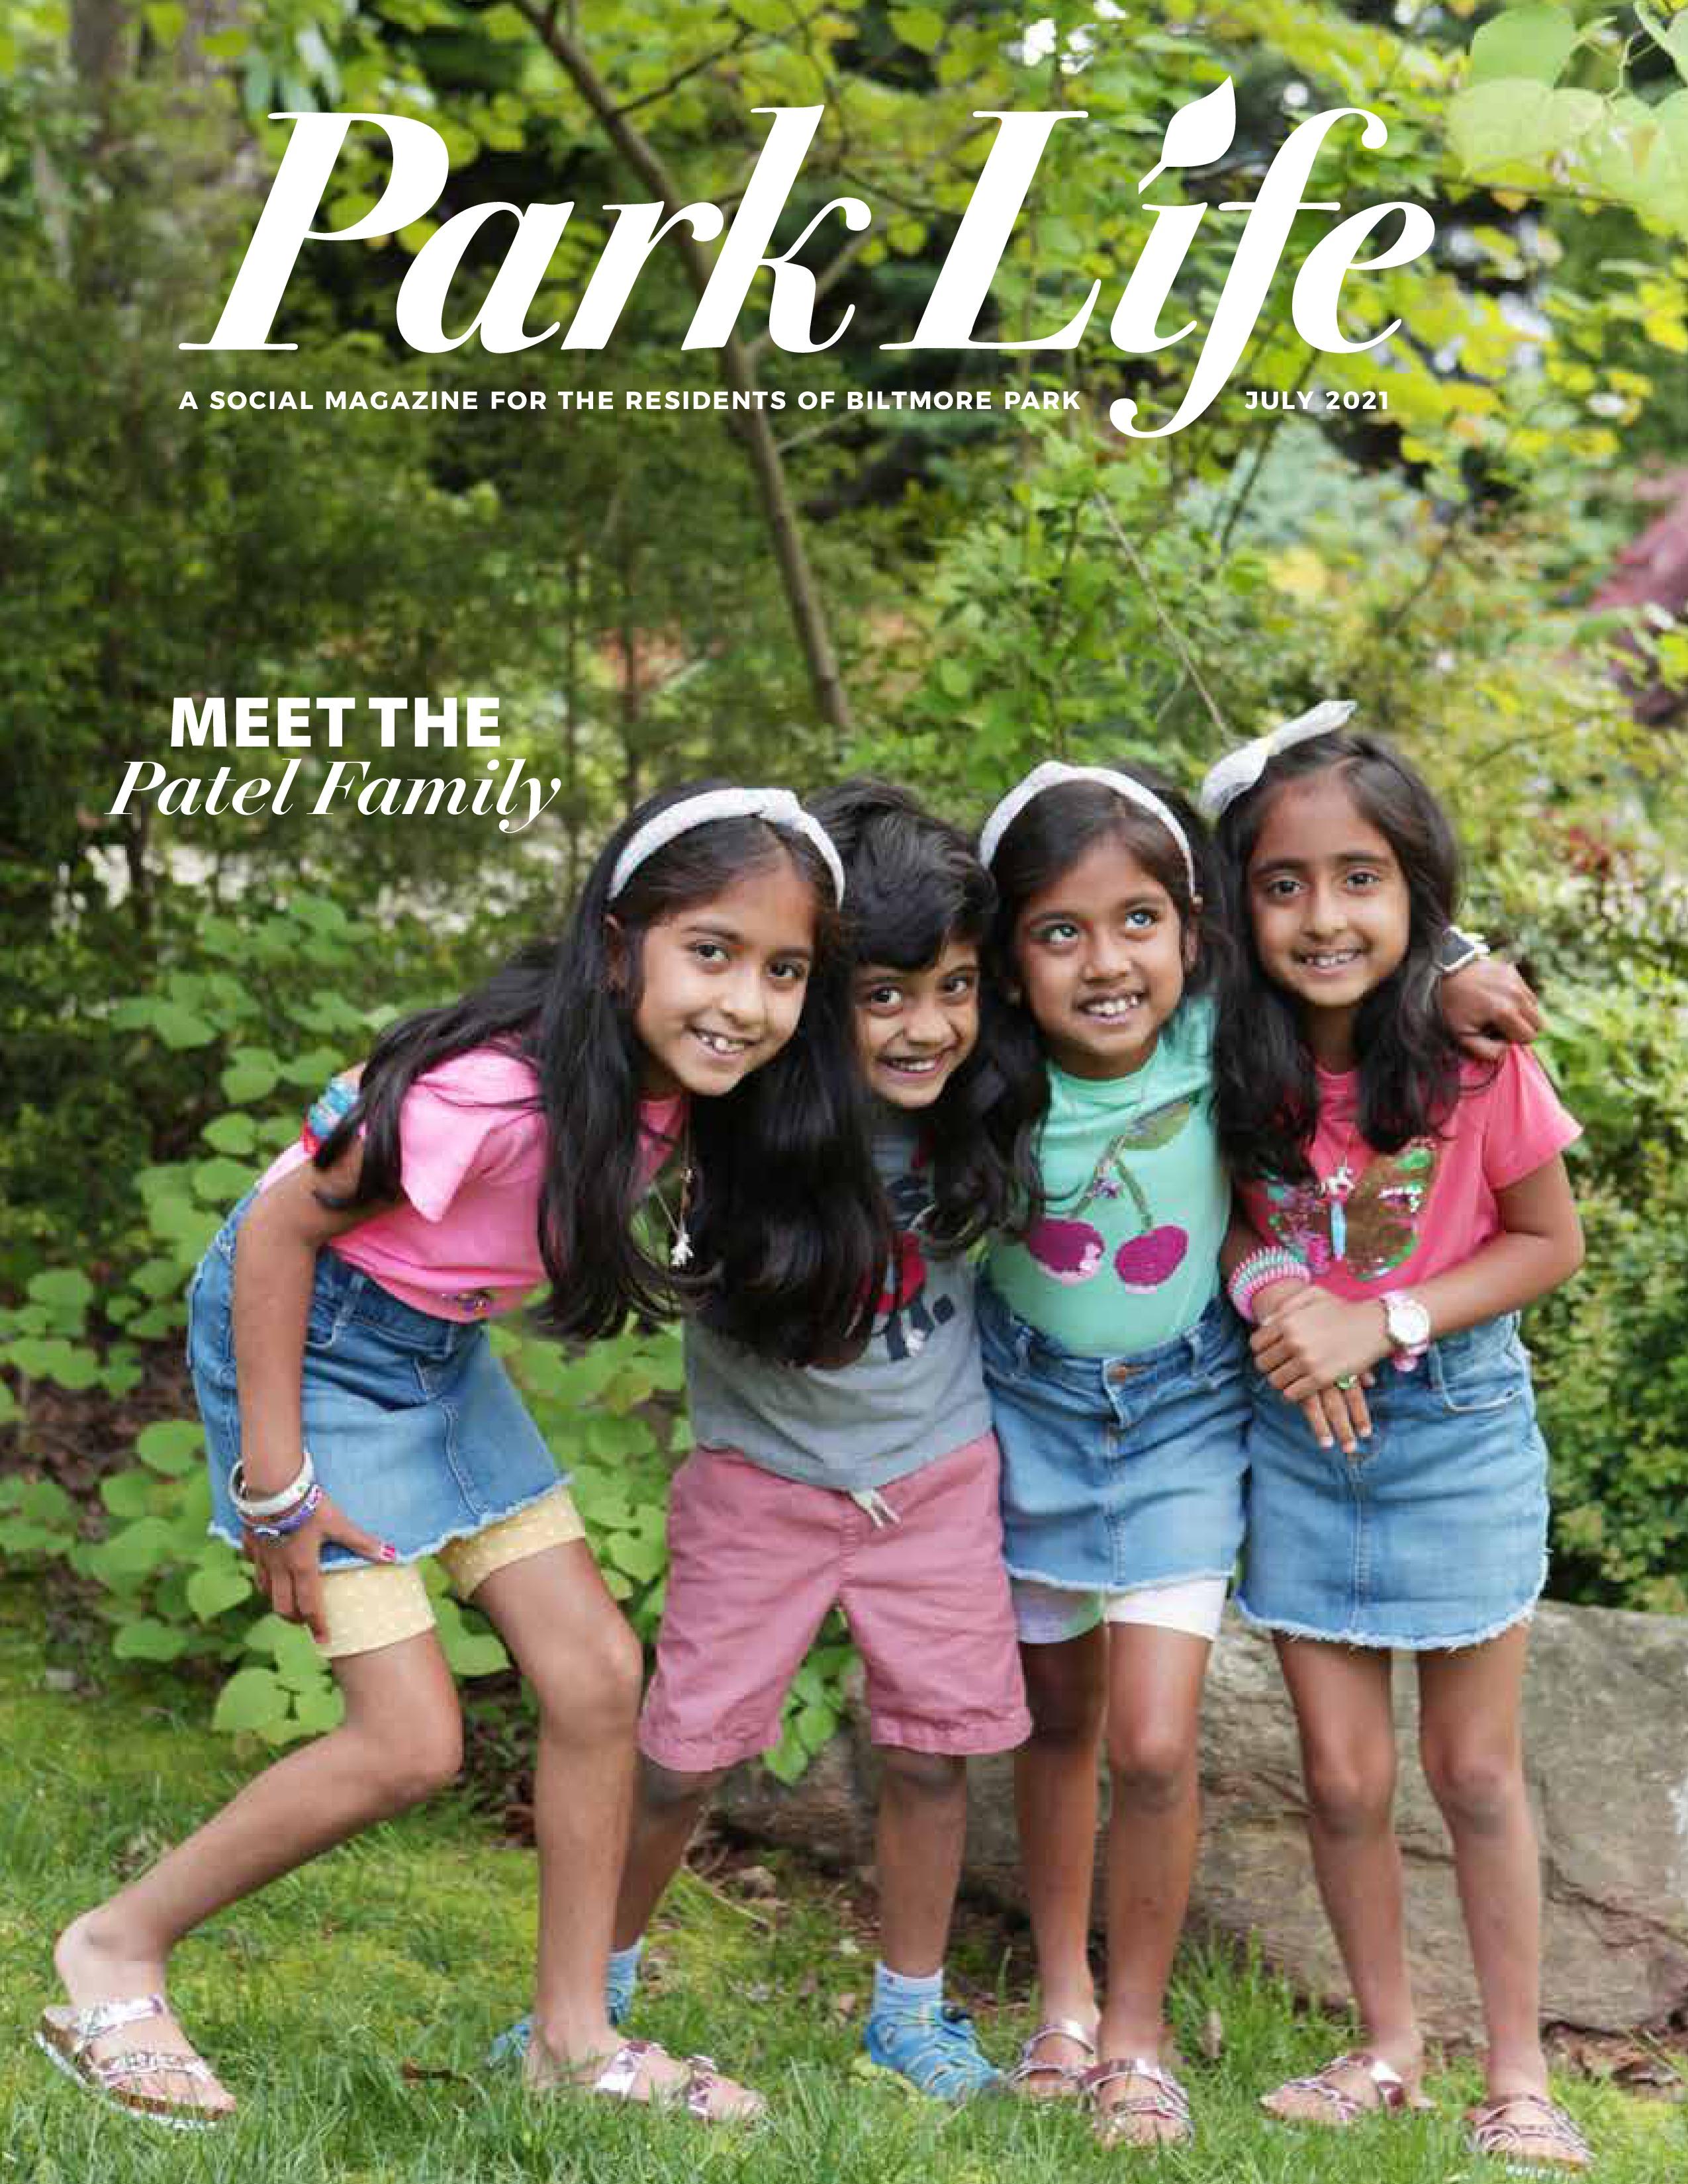 Park Life 2021-07-01